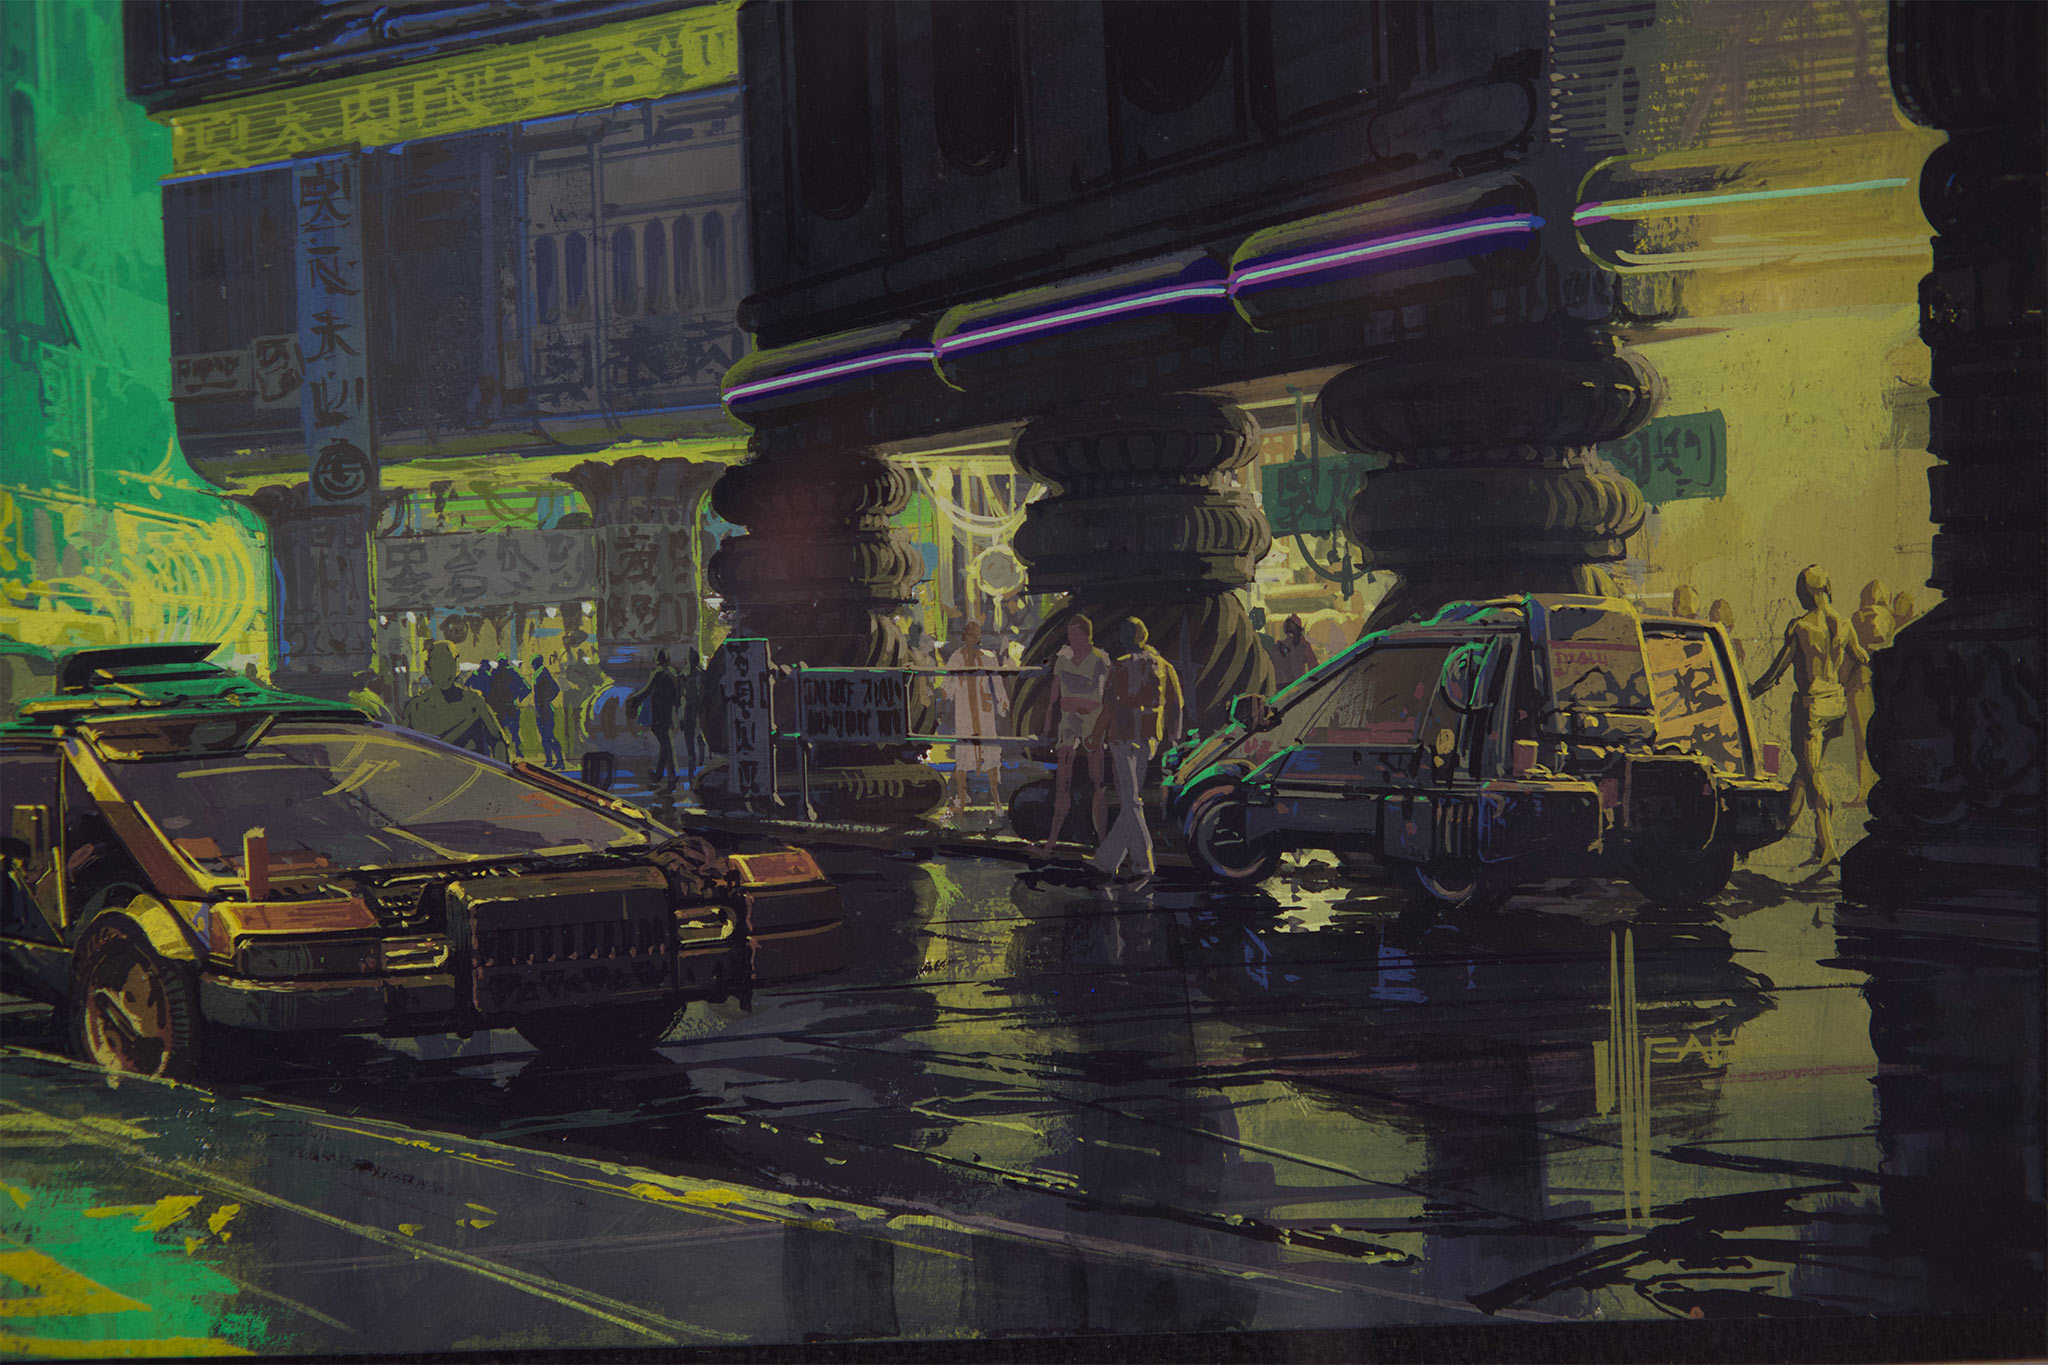 Phenomenon Blade Runner - Artwork